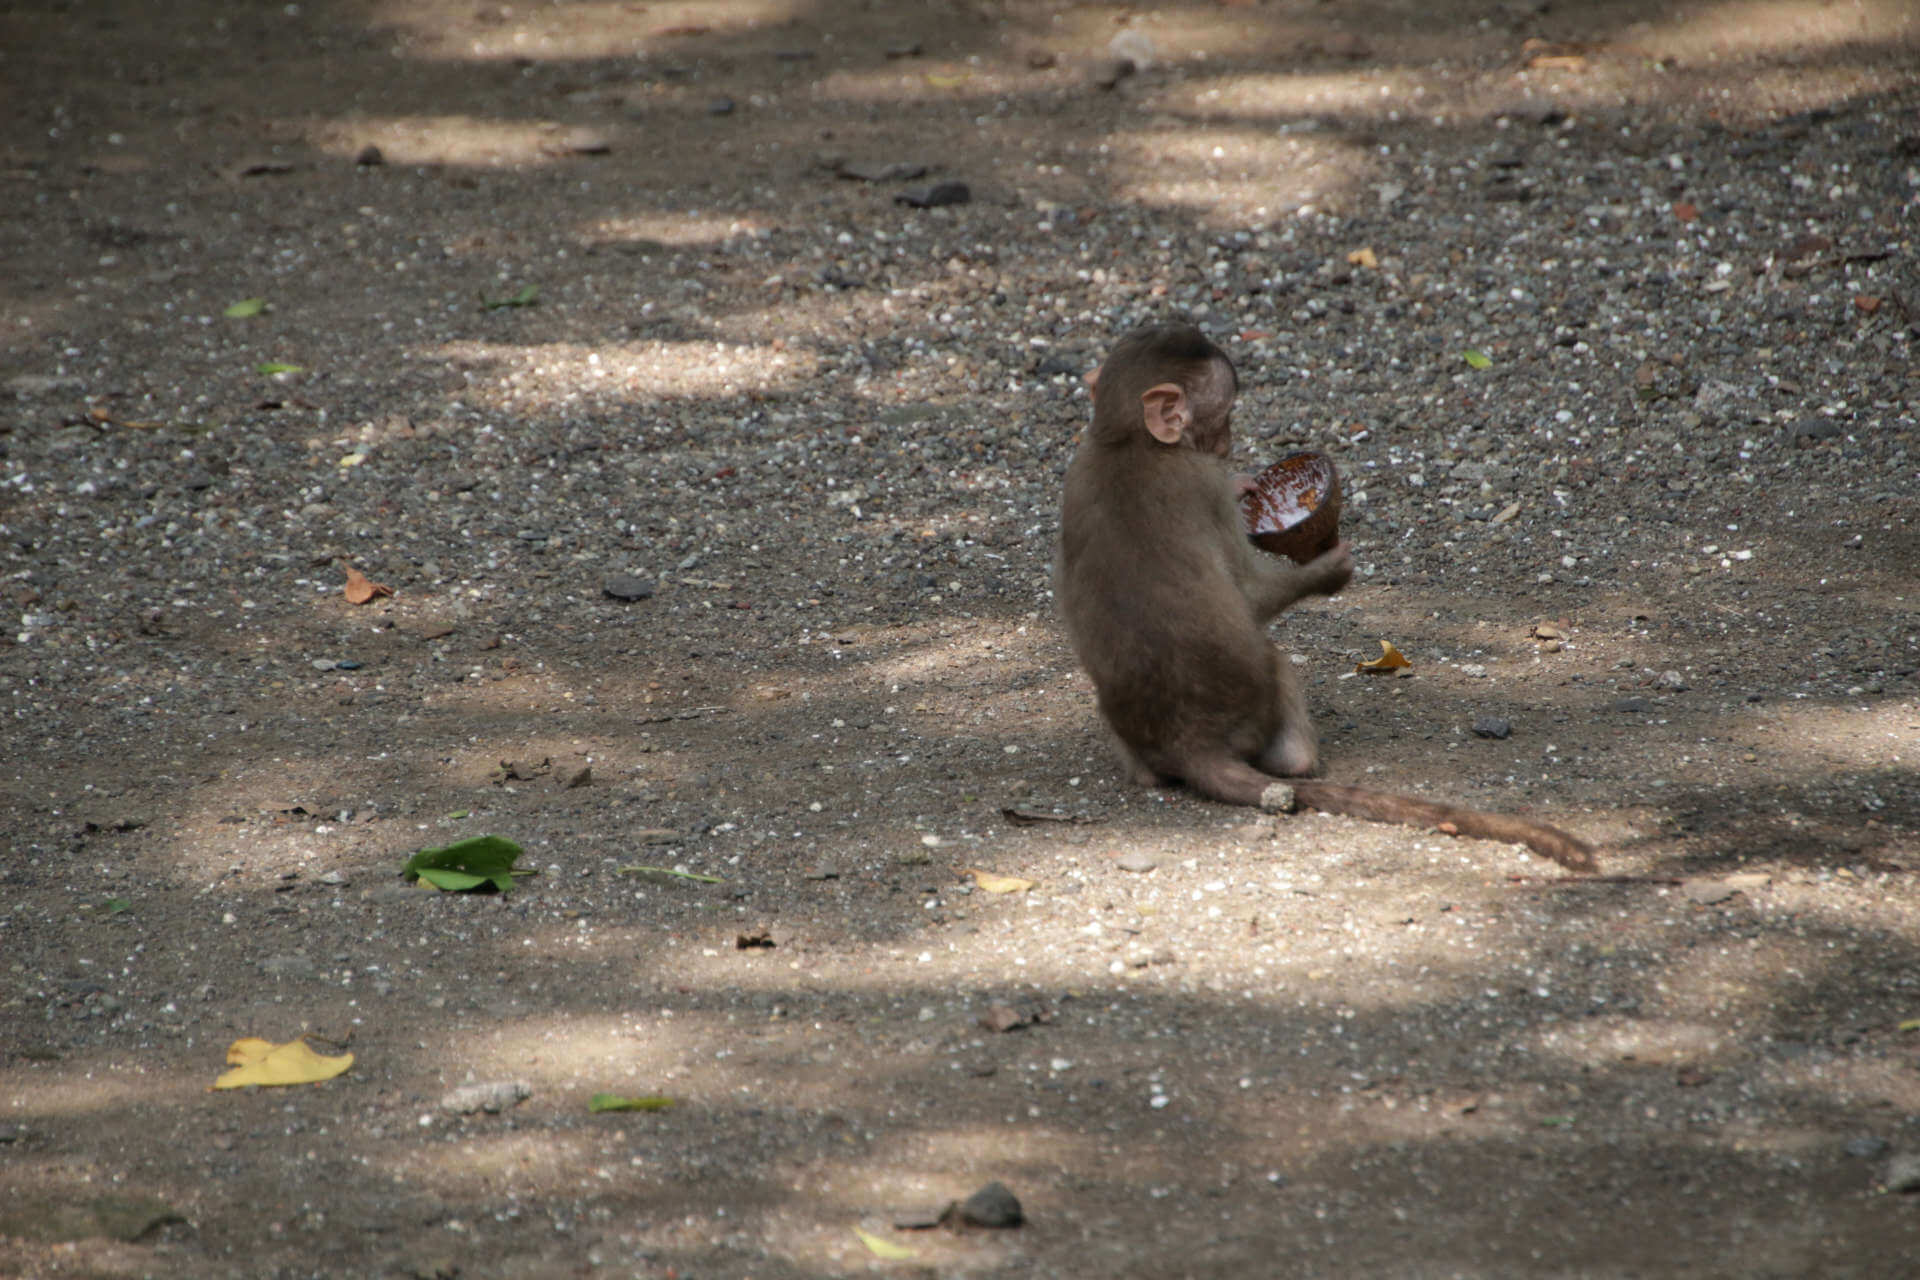 Indien Mumbai Elephanta Island Babyaffe isst